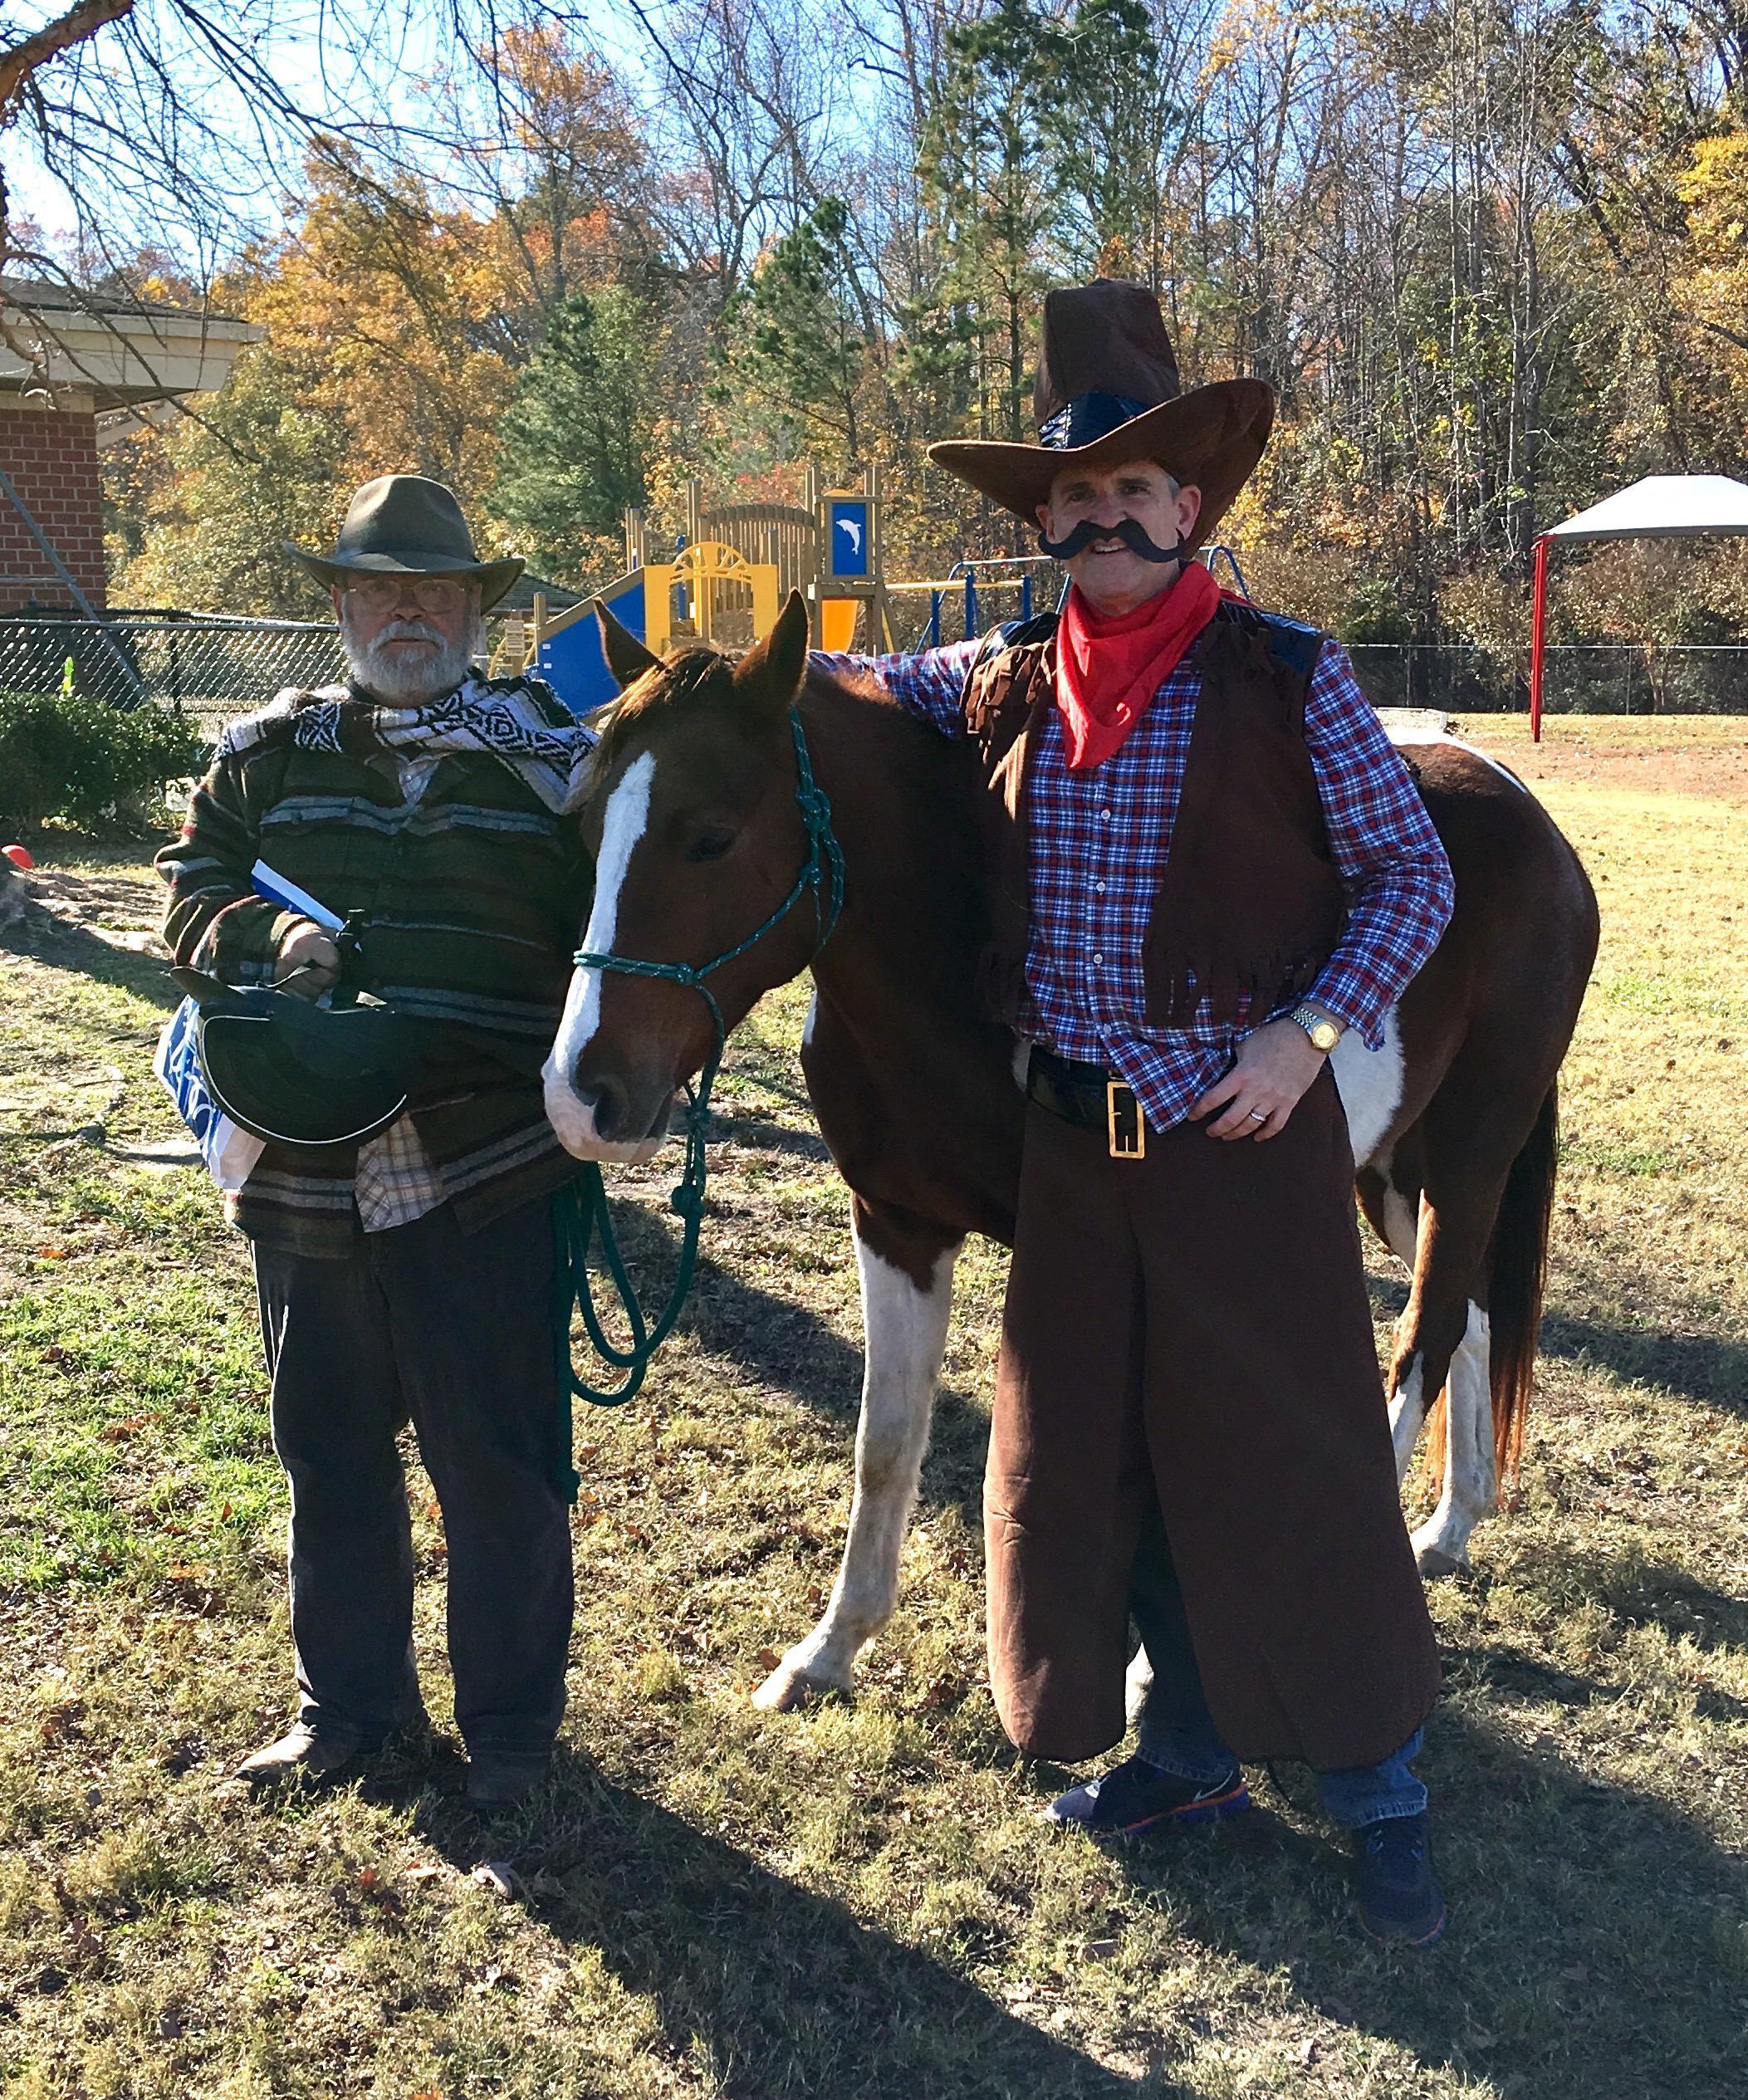 mr. brennan dressed as a cowboy with a horse